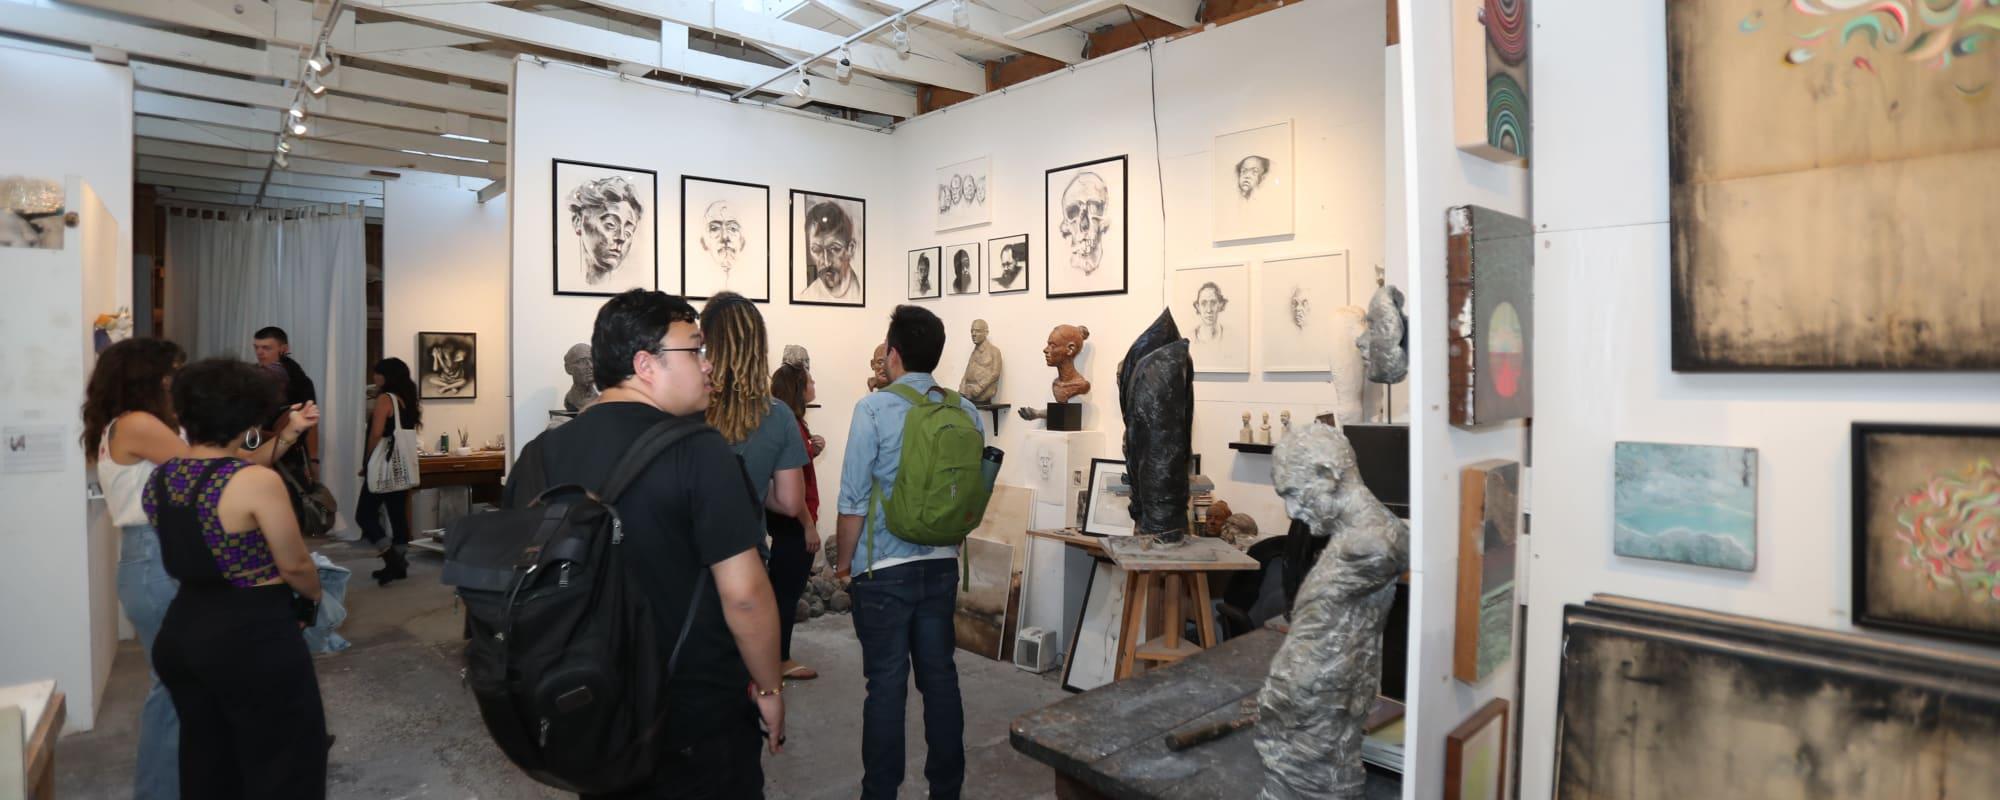 Art gallery near The Moran in Oakland, California